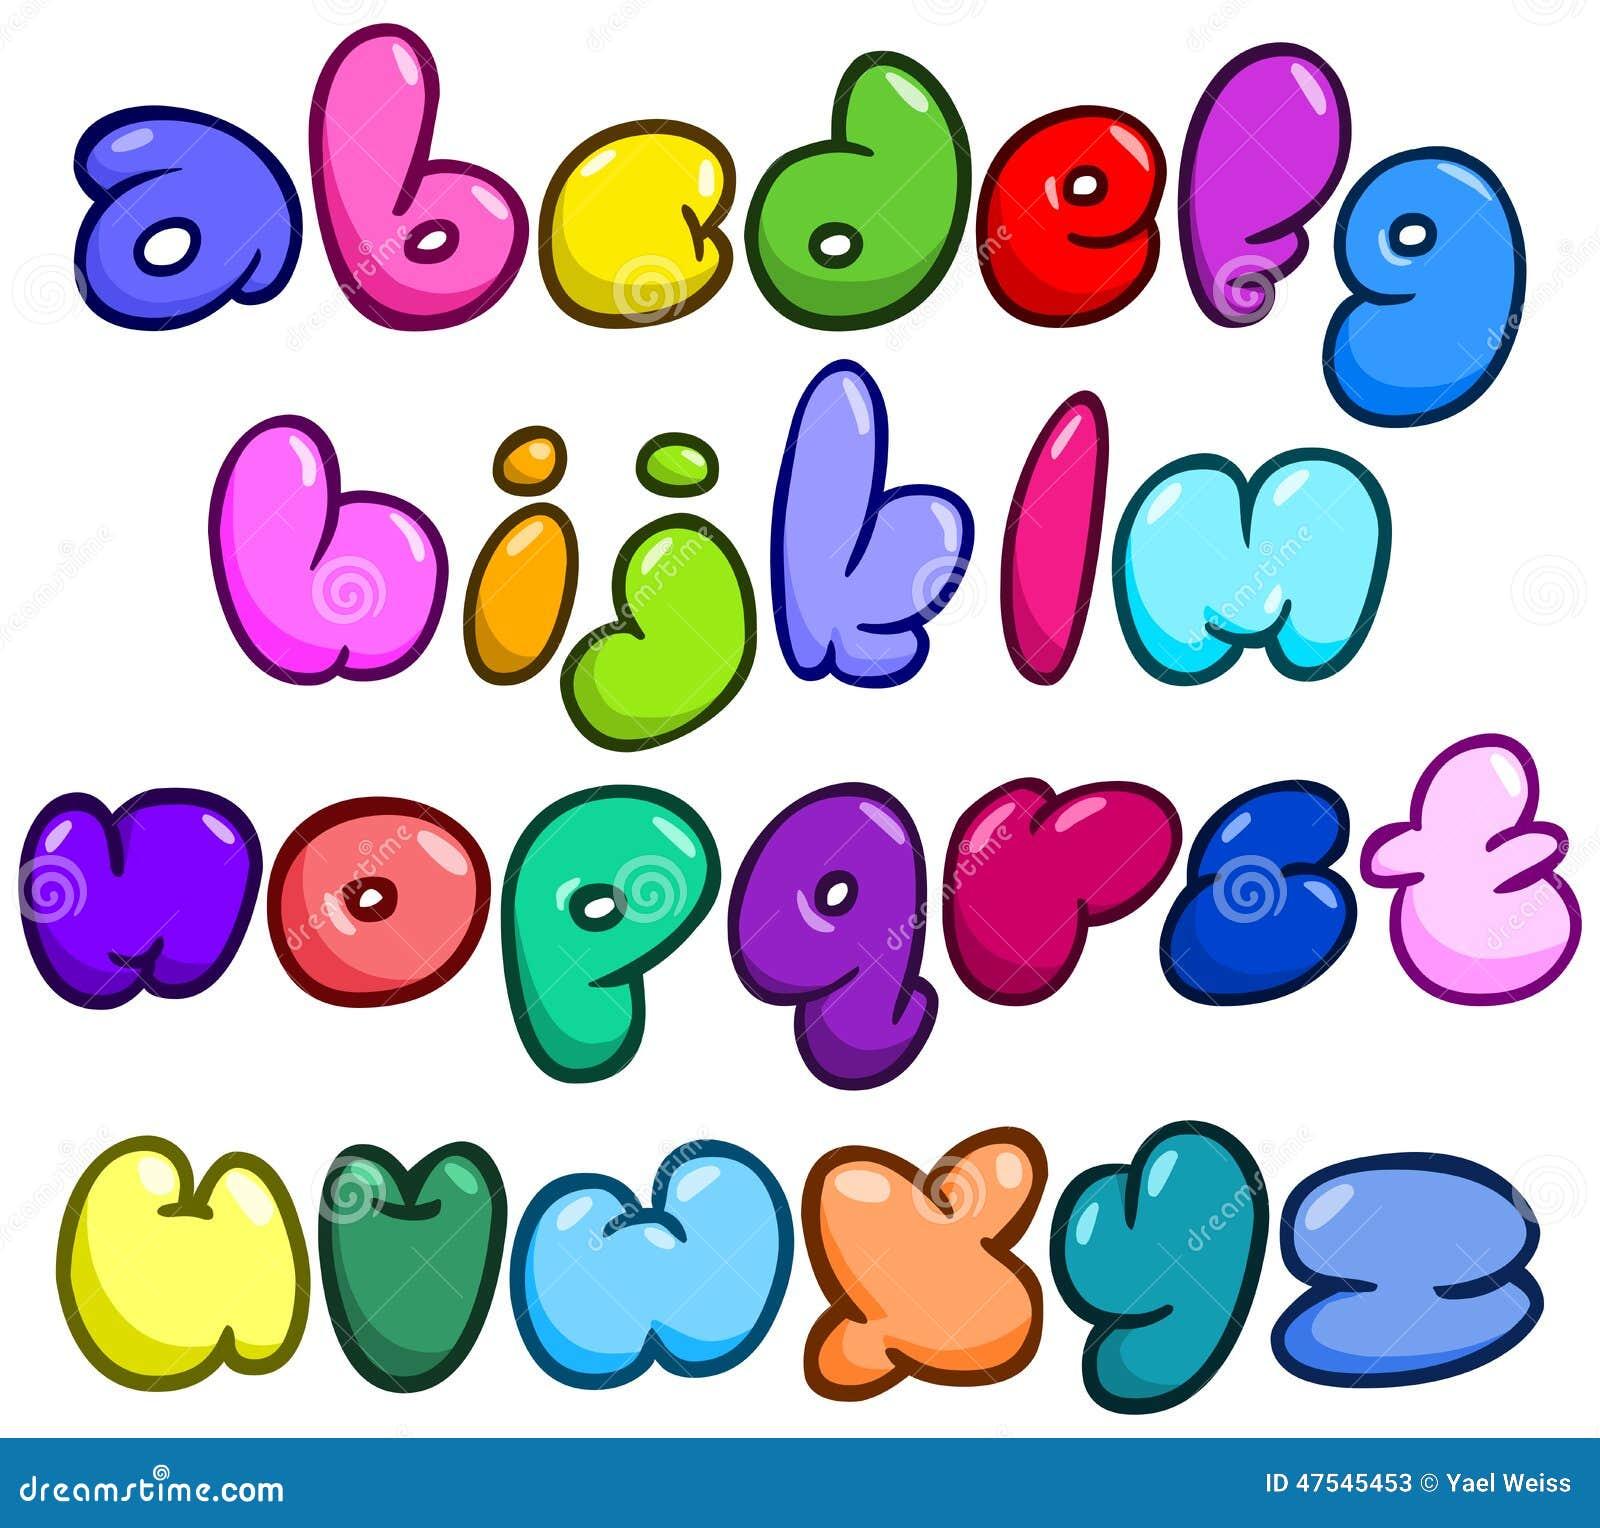 Bubble Letters Uppercase  BubbleLettersOrg